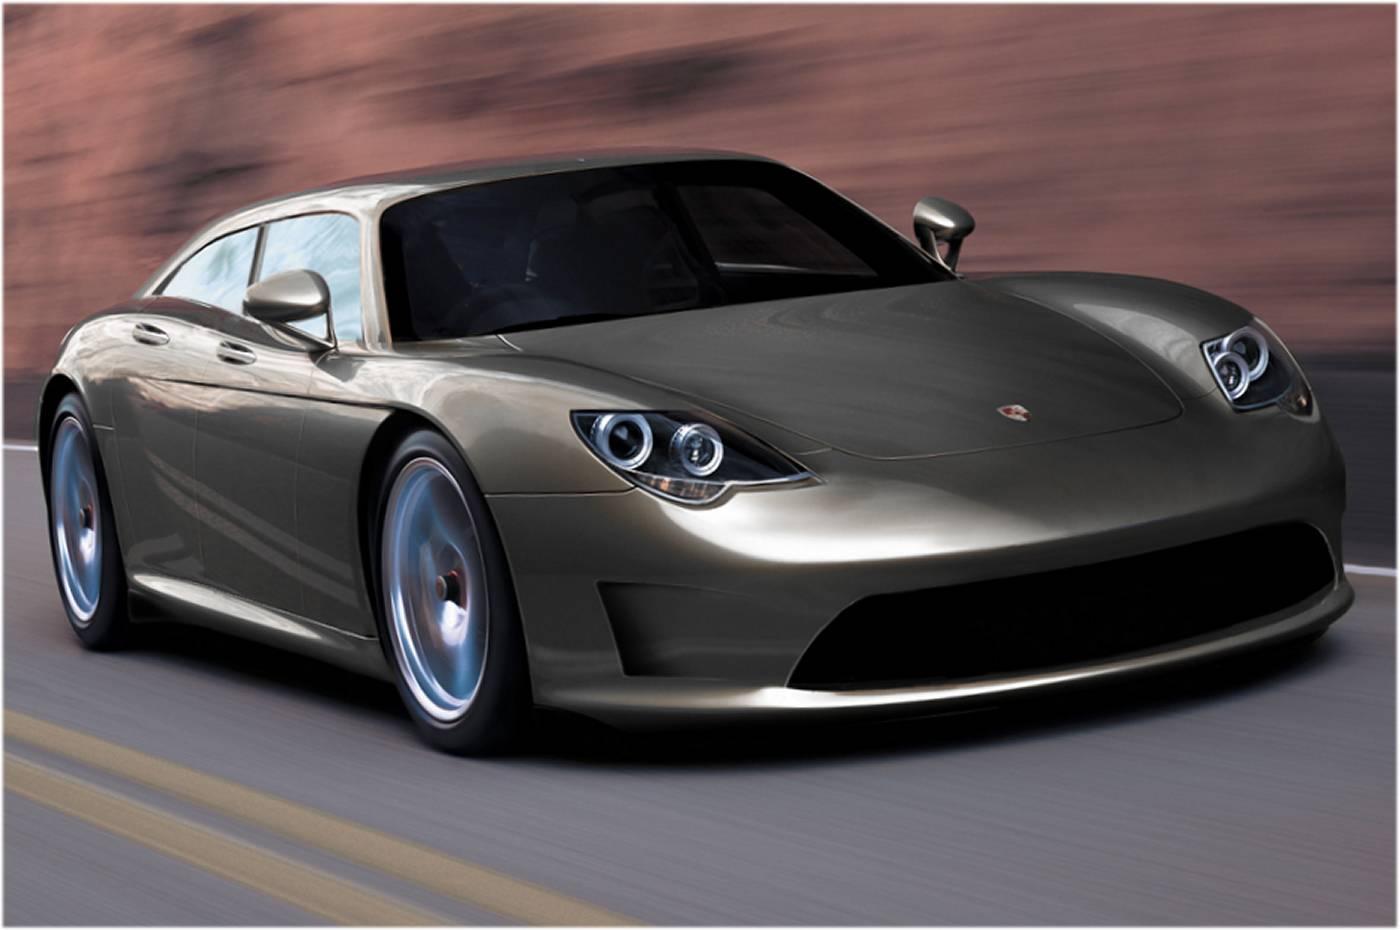 http://4.bp.blogspot.com/-R324ca-gjZY/TkOungKejUI/AAAAAAAADNQ/GzZPvNNa7o8/s1600/New-Amazing-Cars-Wallpaper+%25288%2529.jpg